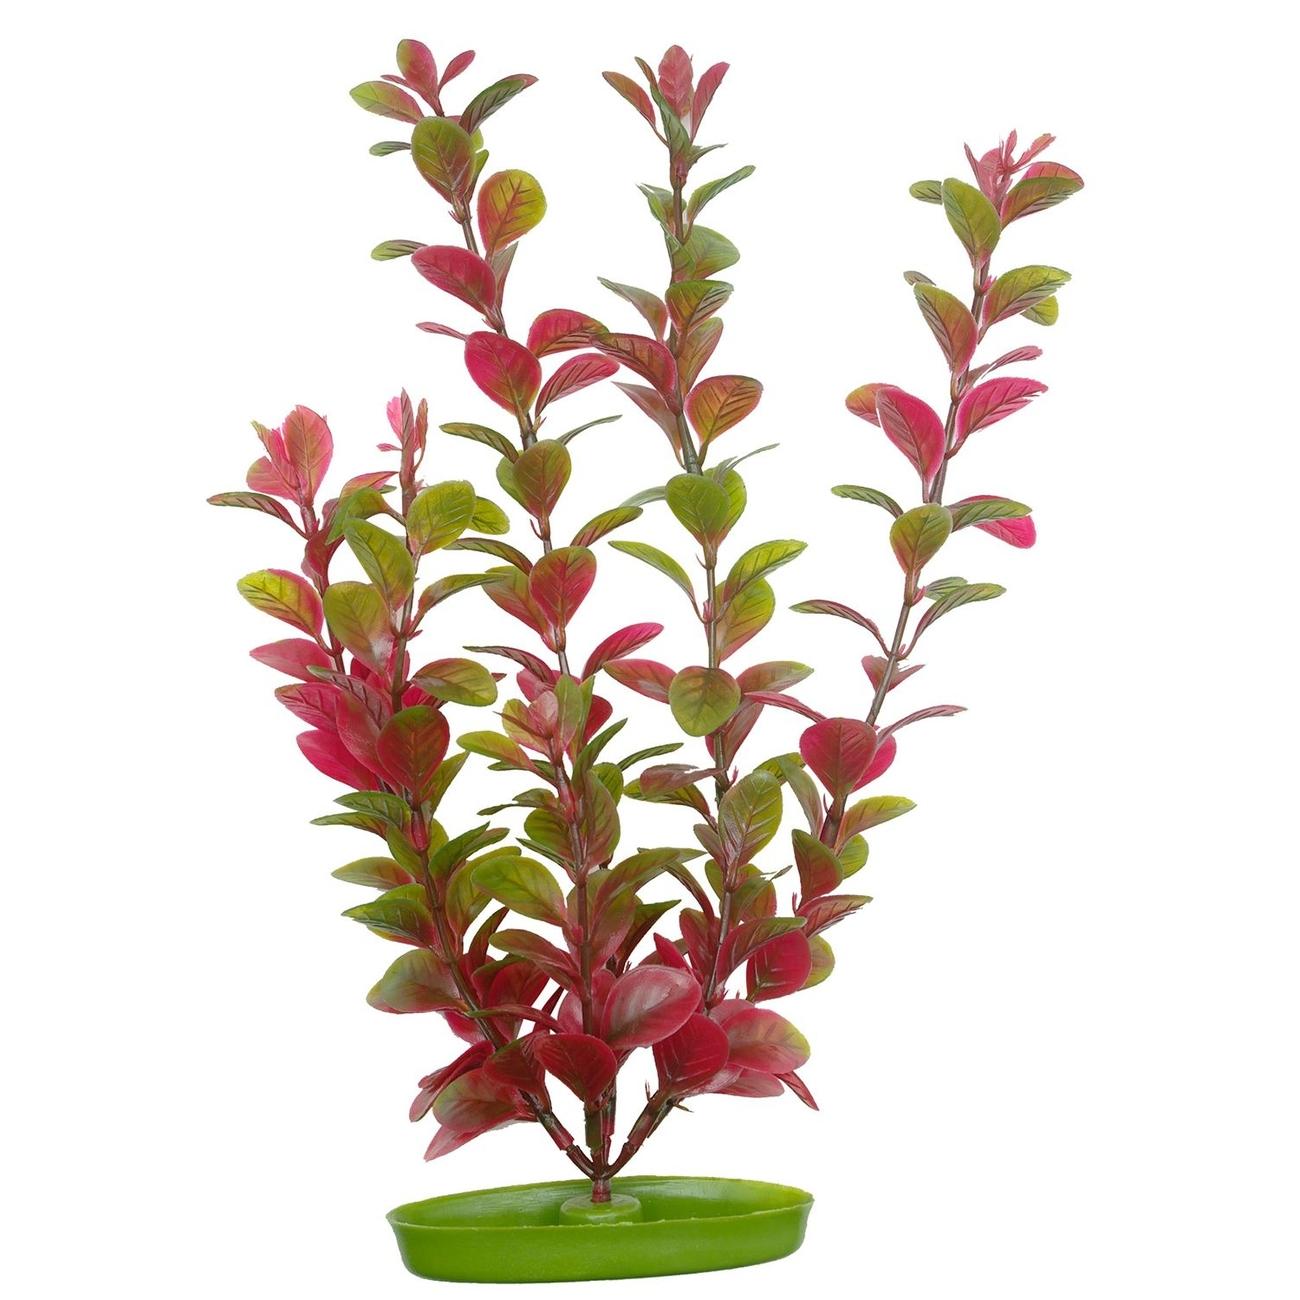 Hagen Marina Aquascaper Pflanzen ab 30 cm, Red Ludwigia - 8,5 x 3,7 x 25,8 cm